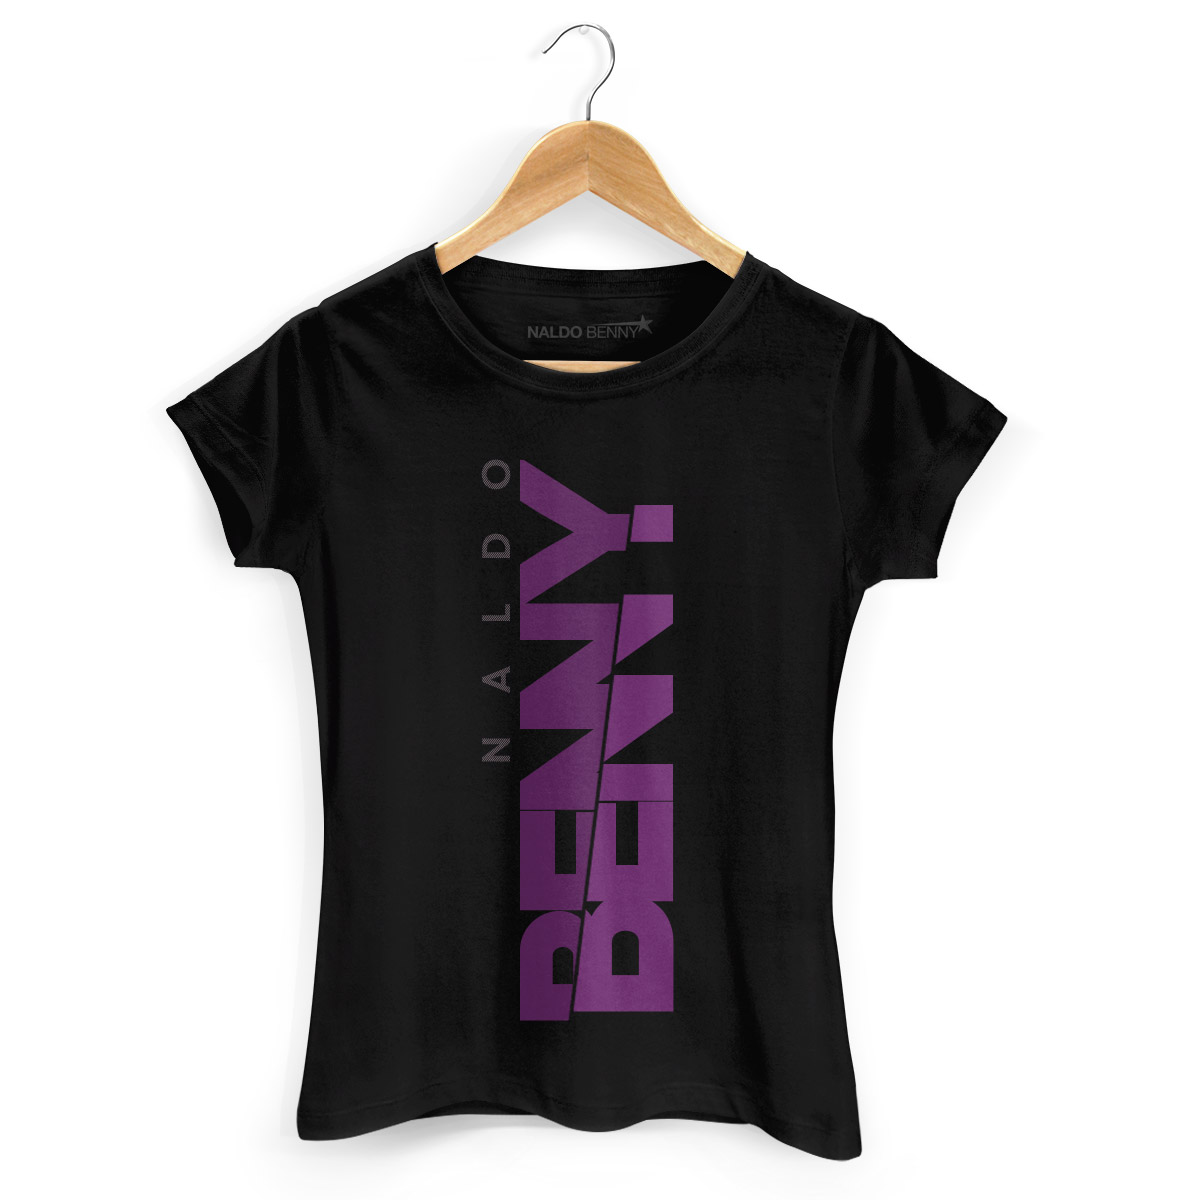 Camiseta Feminina Naldo Benny Dance